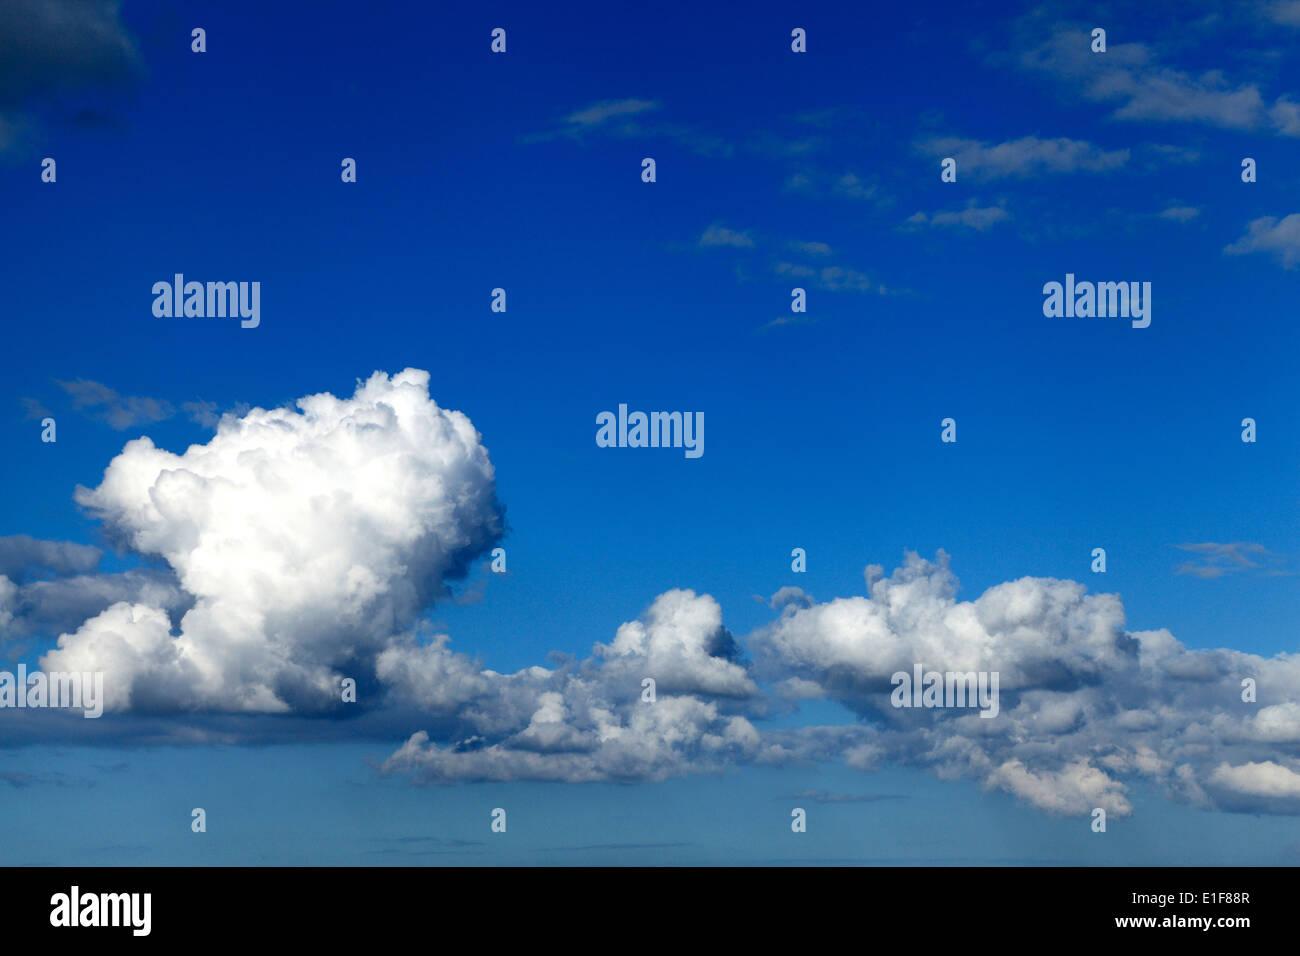 Weißen Cumulus Wolken, blauer Himmel Wolke Himmel UK Stockbild